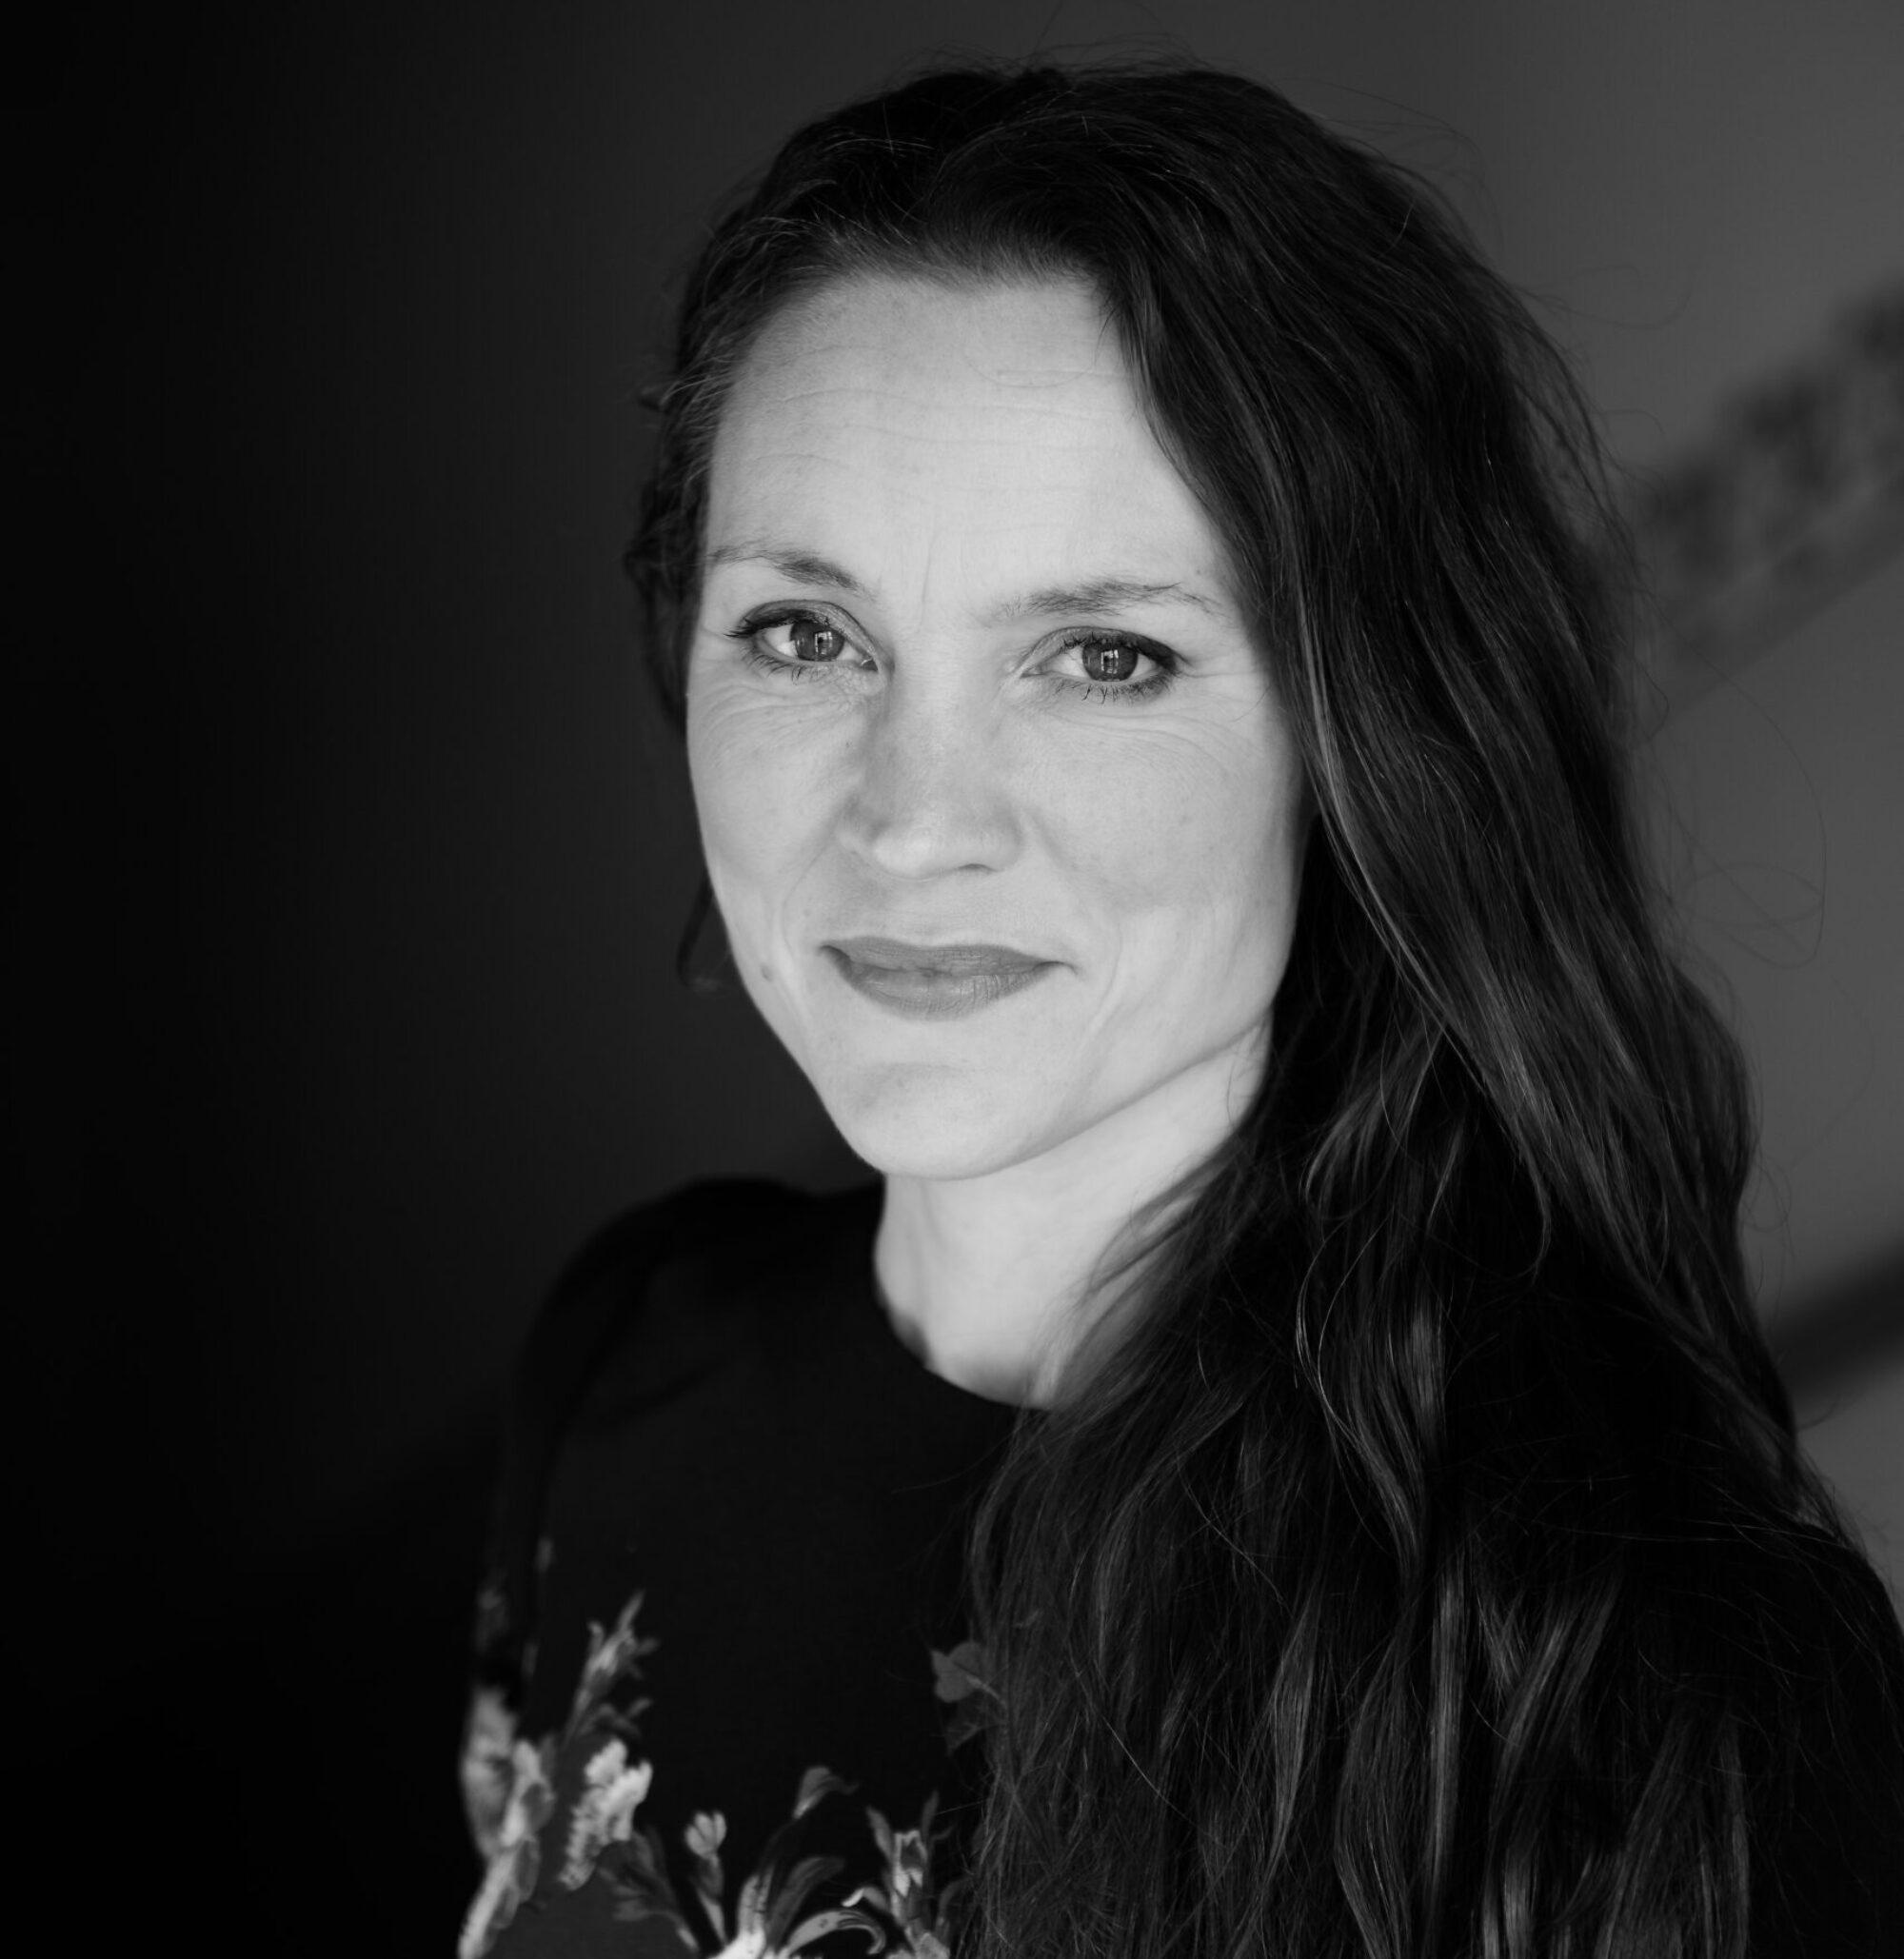 Anna Ander